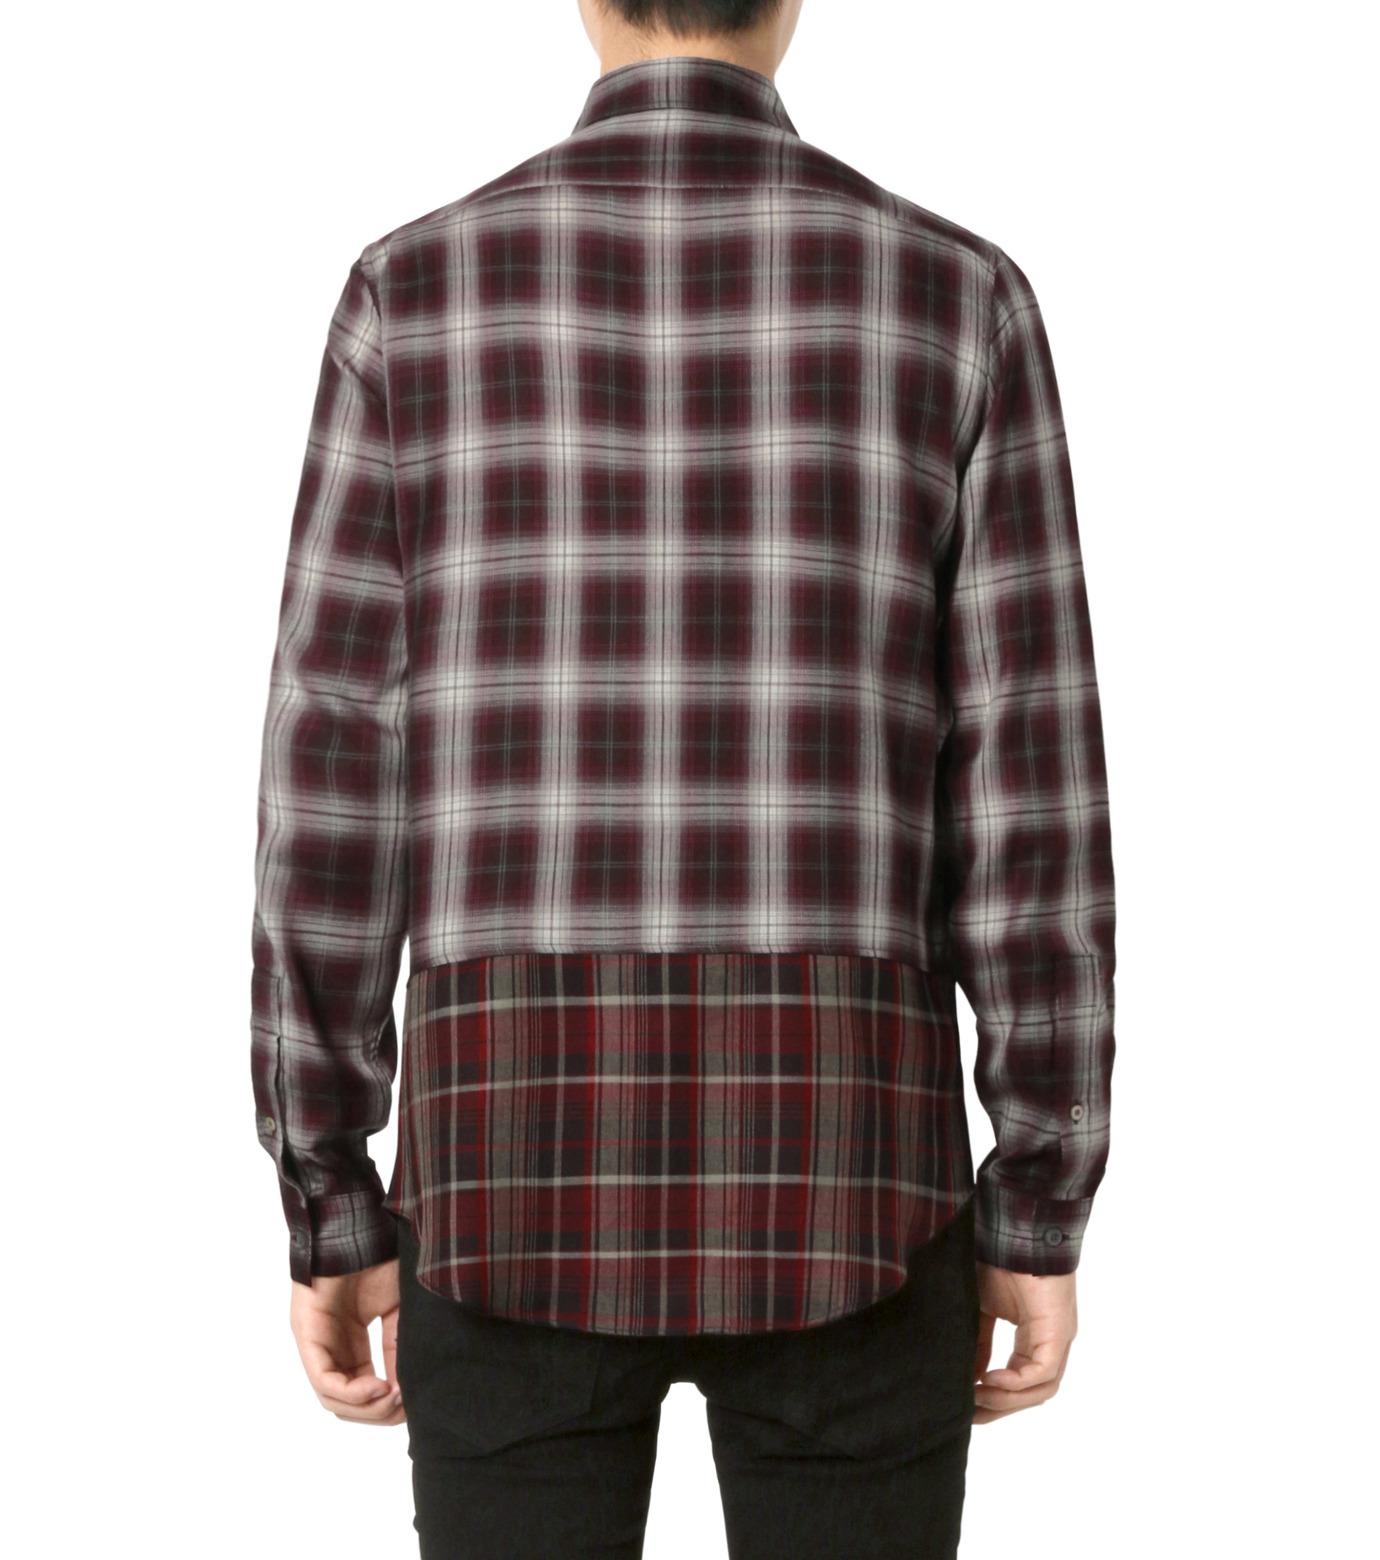 HL HEDDIE LOVU(エイチエル・エディールーヴ)のLAYERED CHECK SHIRT-BORDEAUX(シャツ/shirt)-18A93001-63 拡大詳細画像2